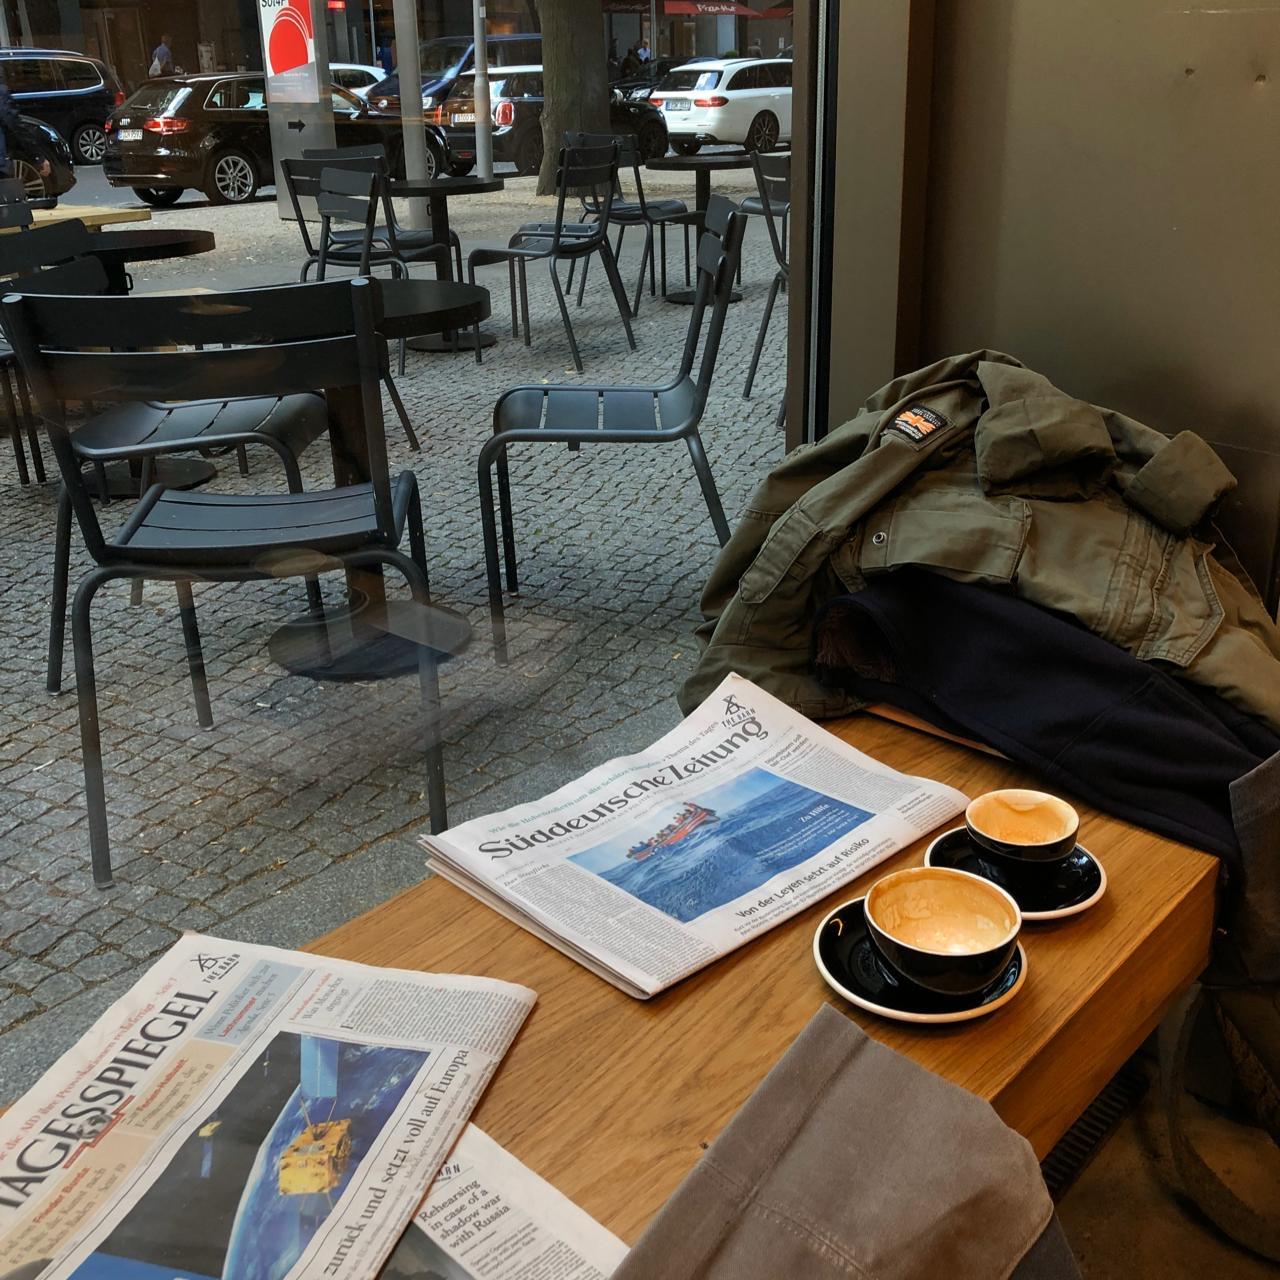 Coronavirus and business: coffee industry perspective